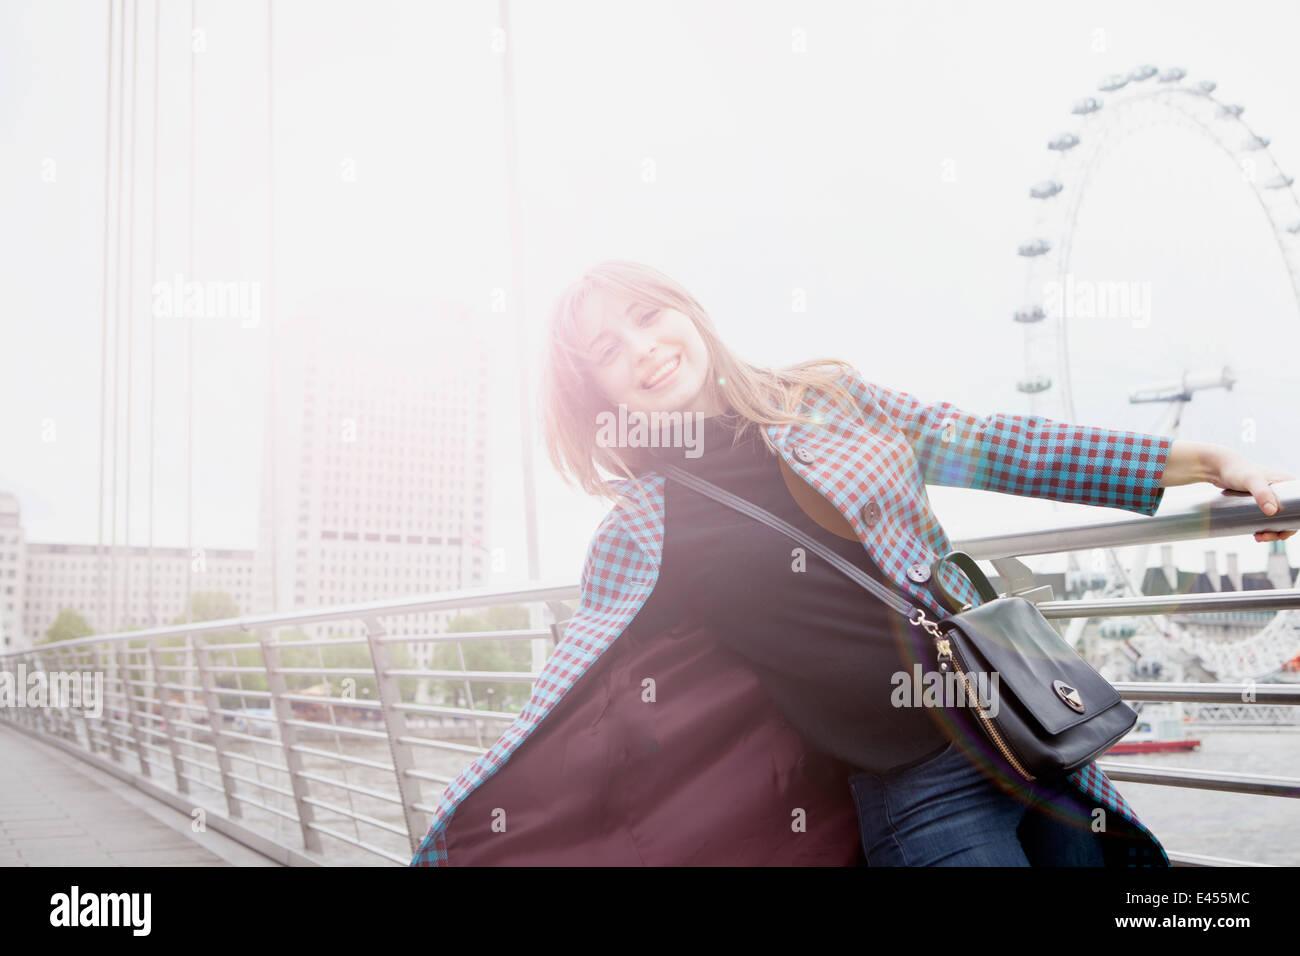 Portrait of young female tourist swinging on Golden Jubilee footbridge, London, UK - Stock Image